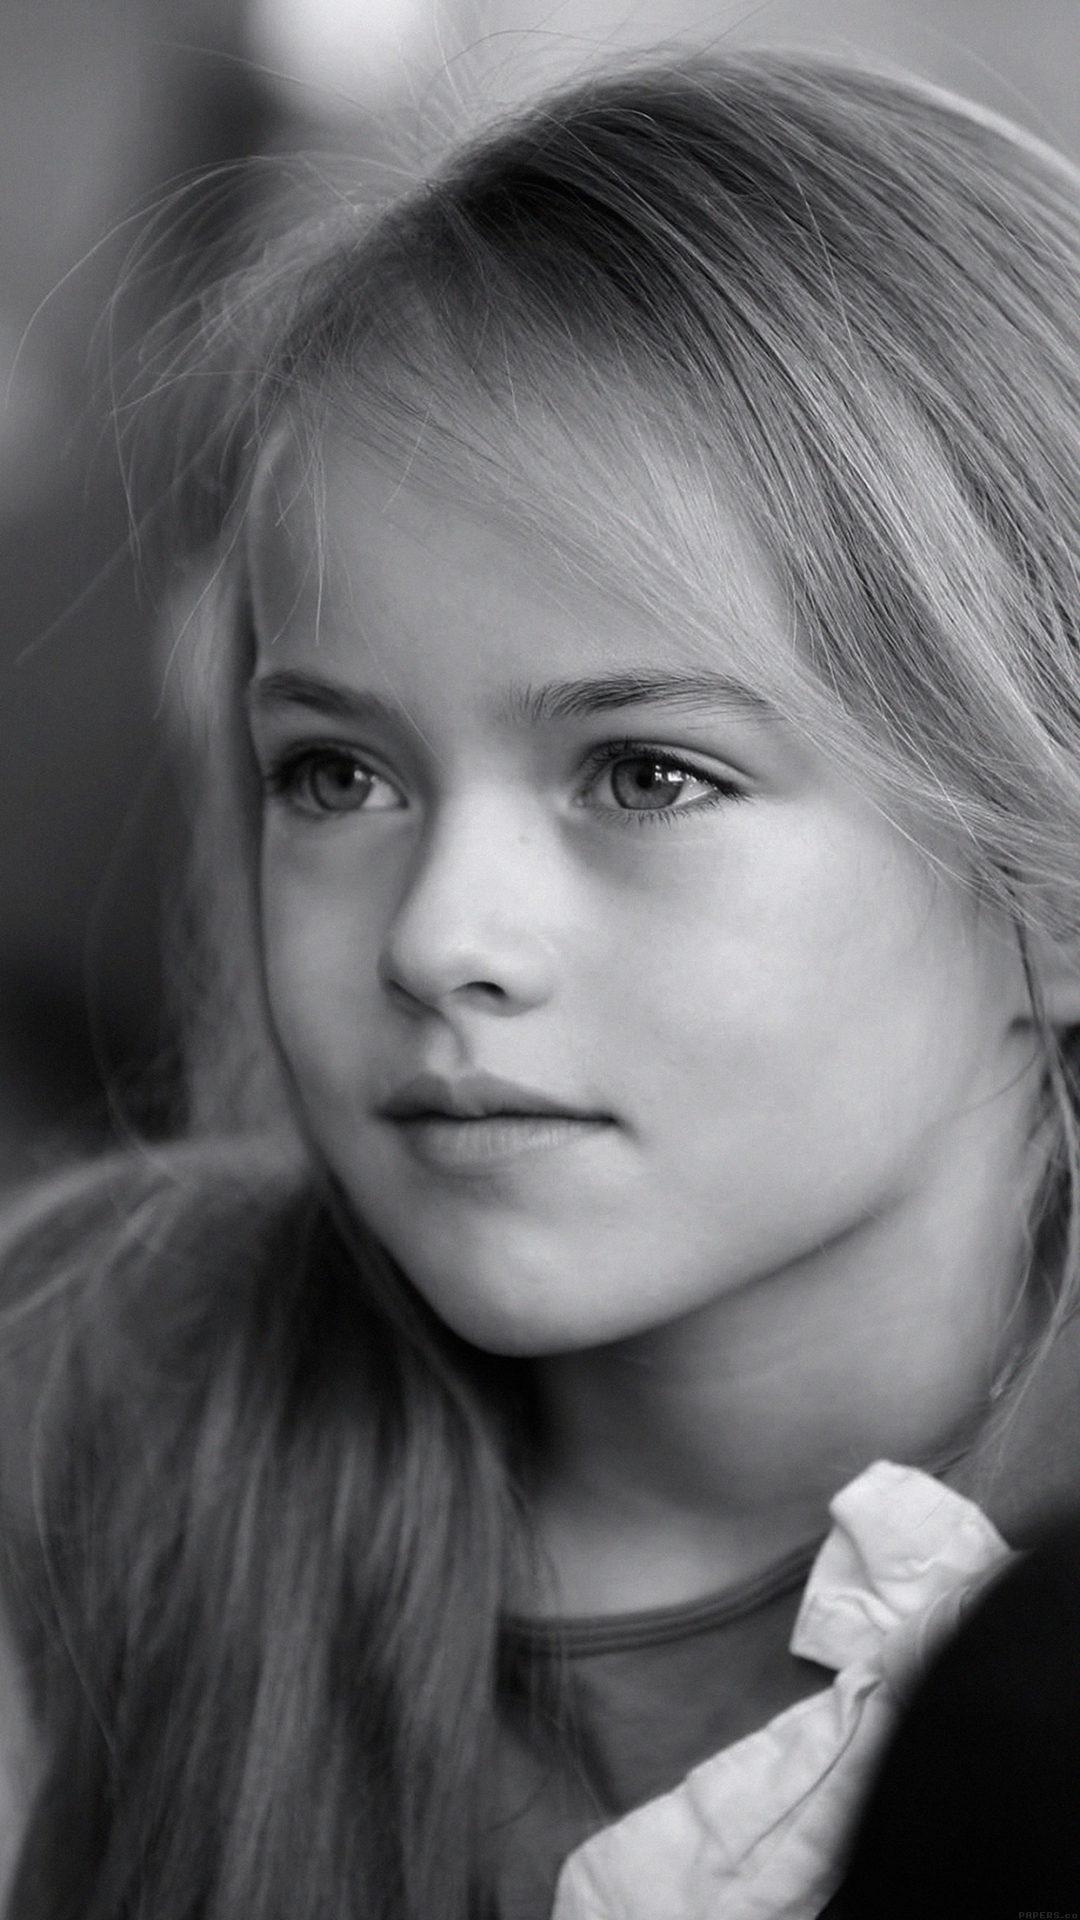 Kristina Pimenova Cute Girl Model Bw Dark